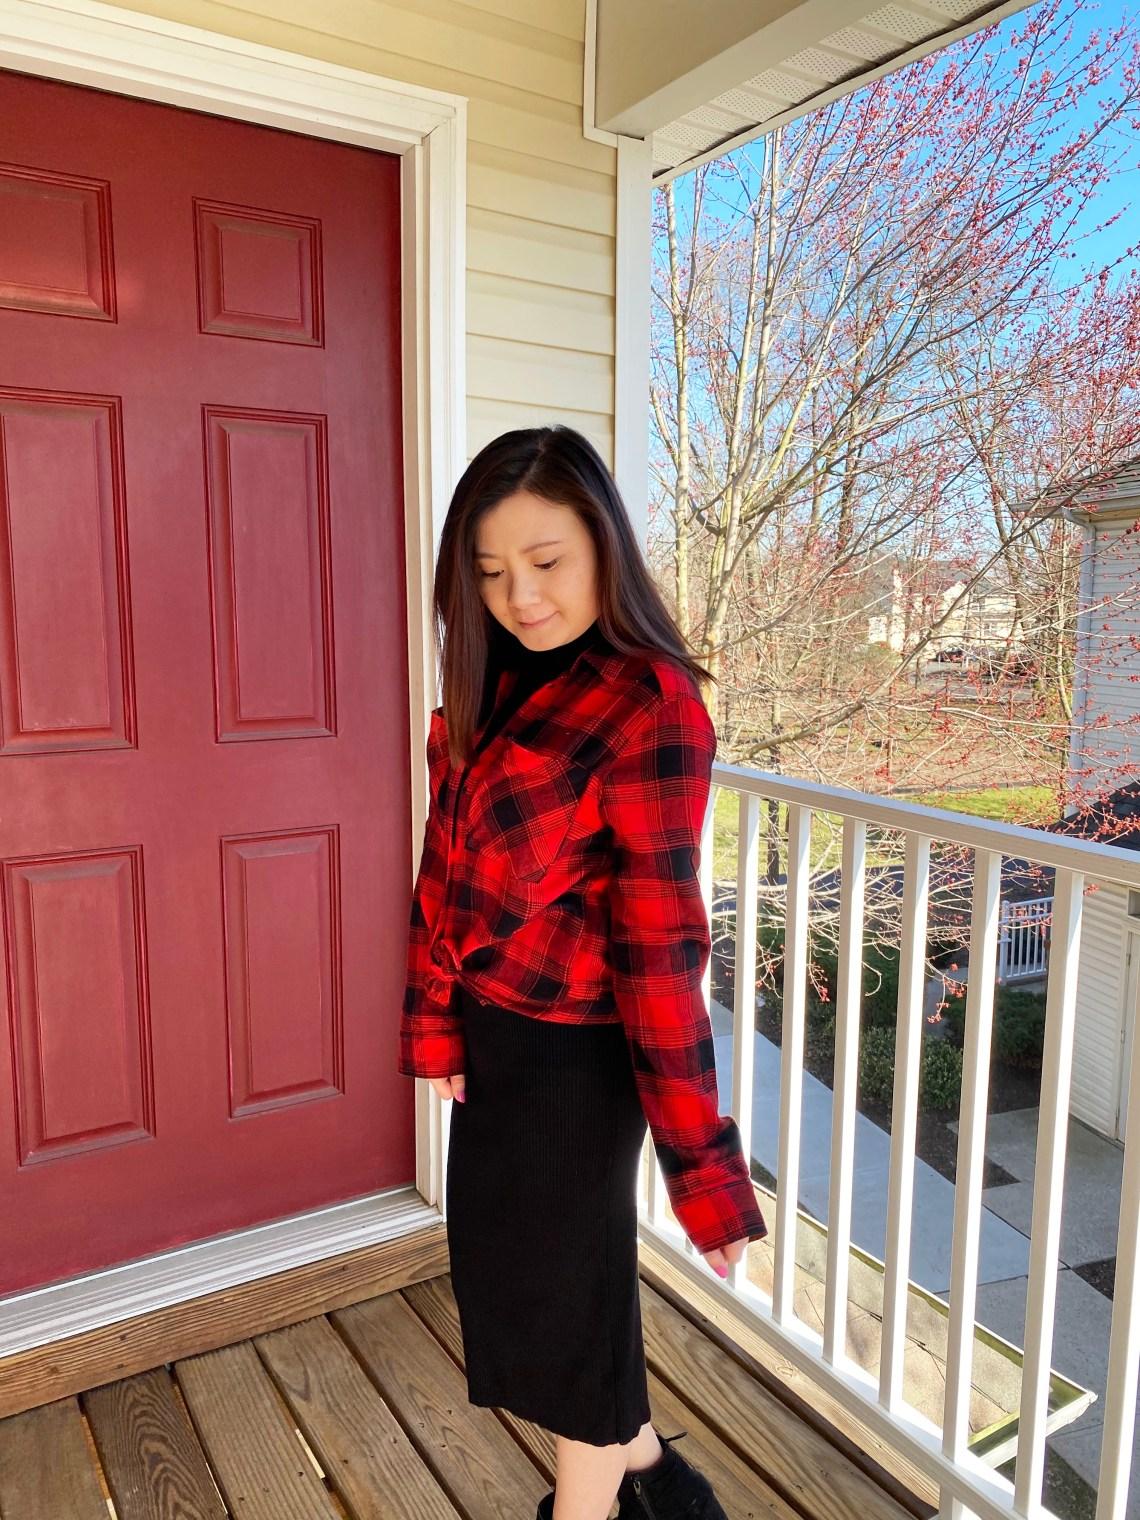 Turtleneck Ribbed Dress + Plaid Shirt